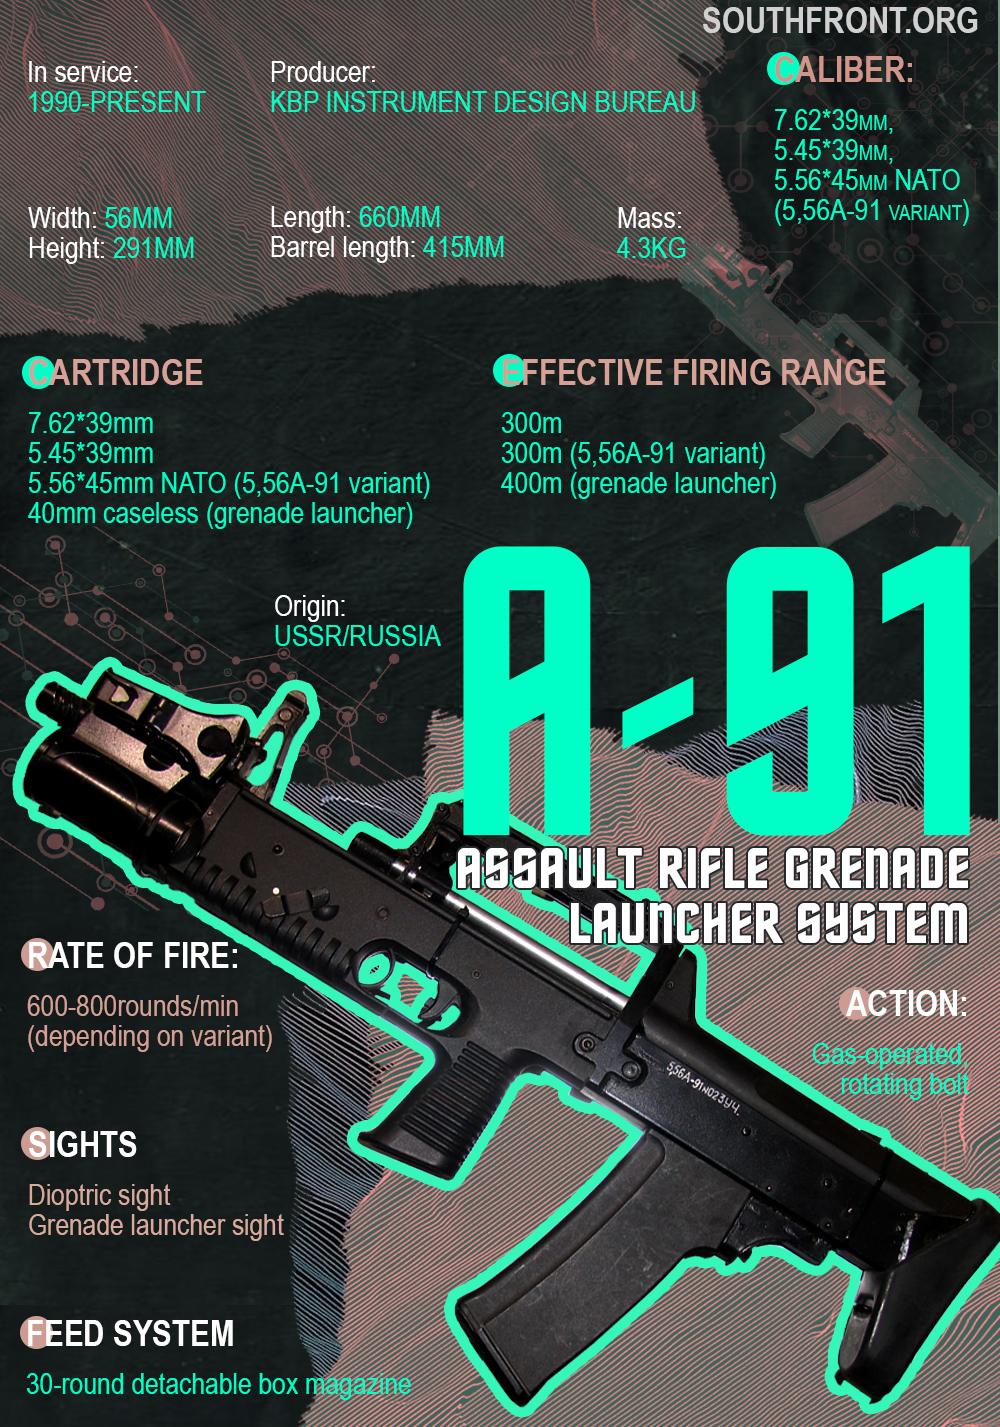 A-91 Assault Rifle Grenade Launcher System (Infographics)